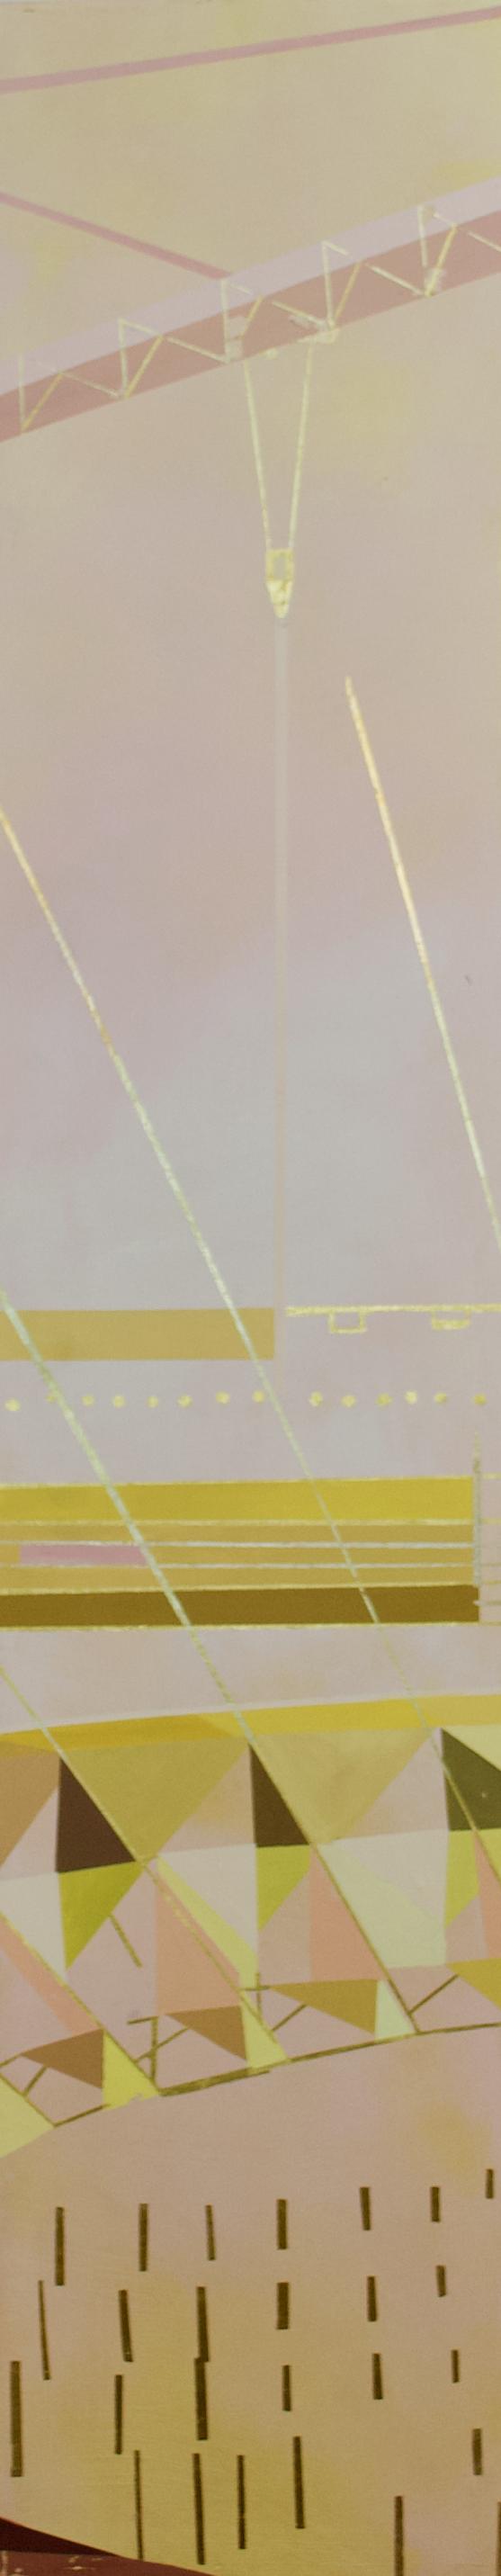 "Wonderwheel #37 - 50"" x 10"" oil and gold leaf on panel$1600"